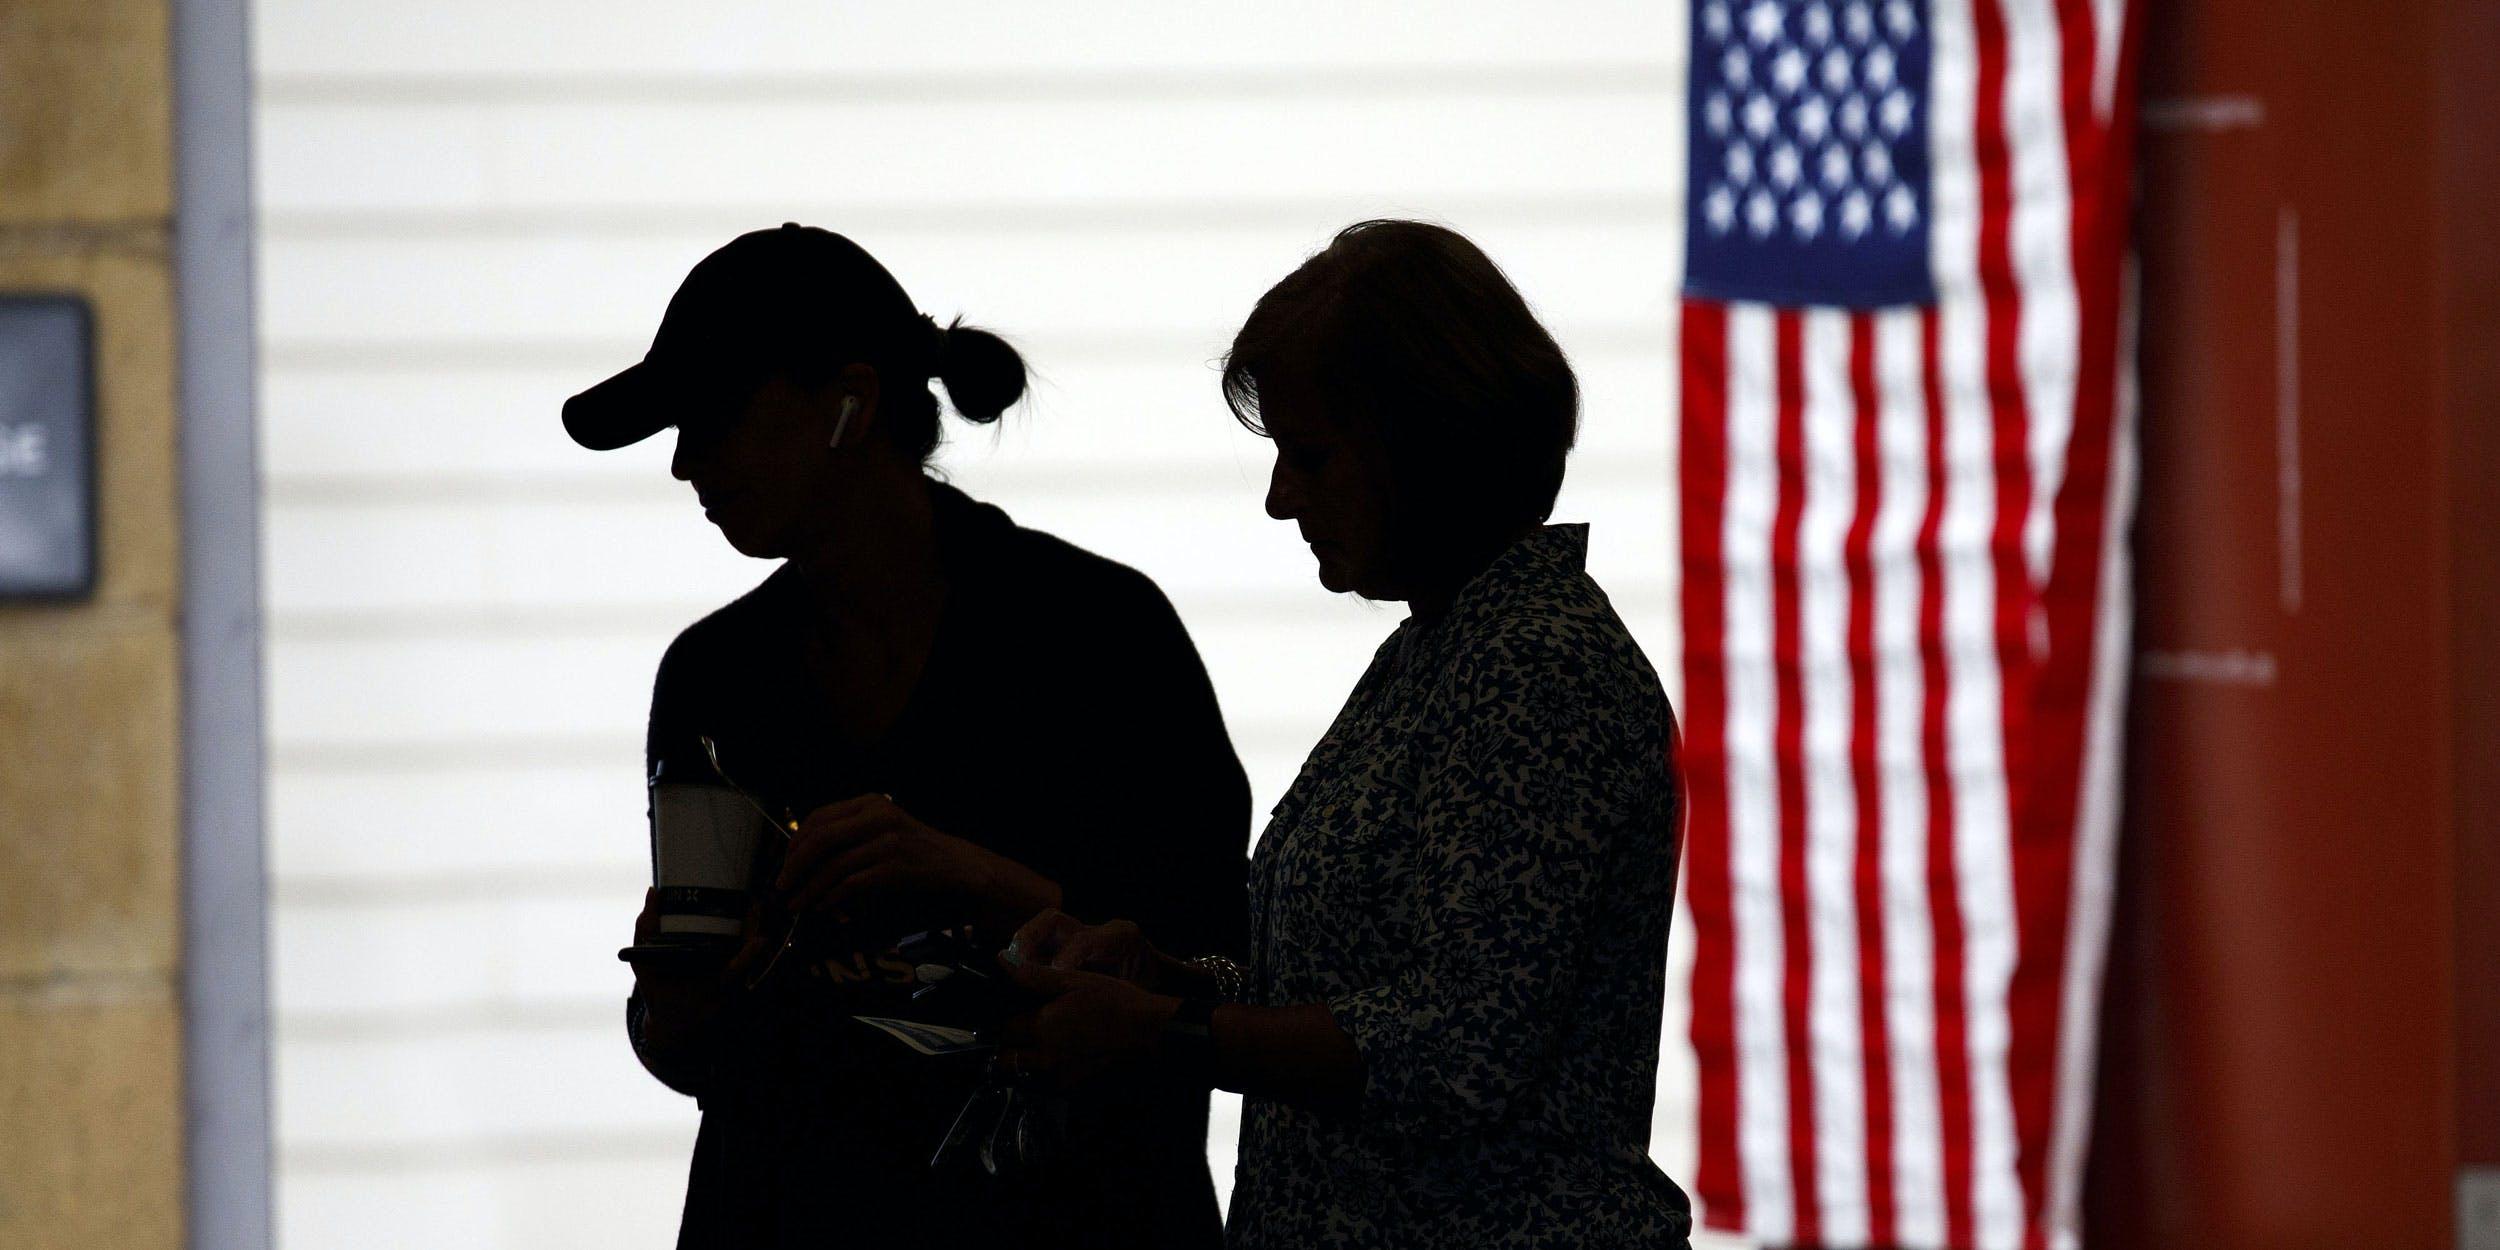 Michigan voters split on legalization